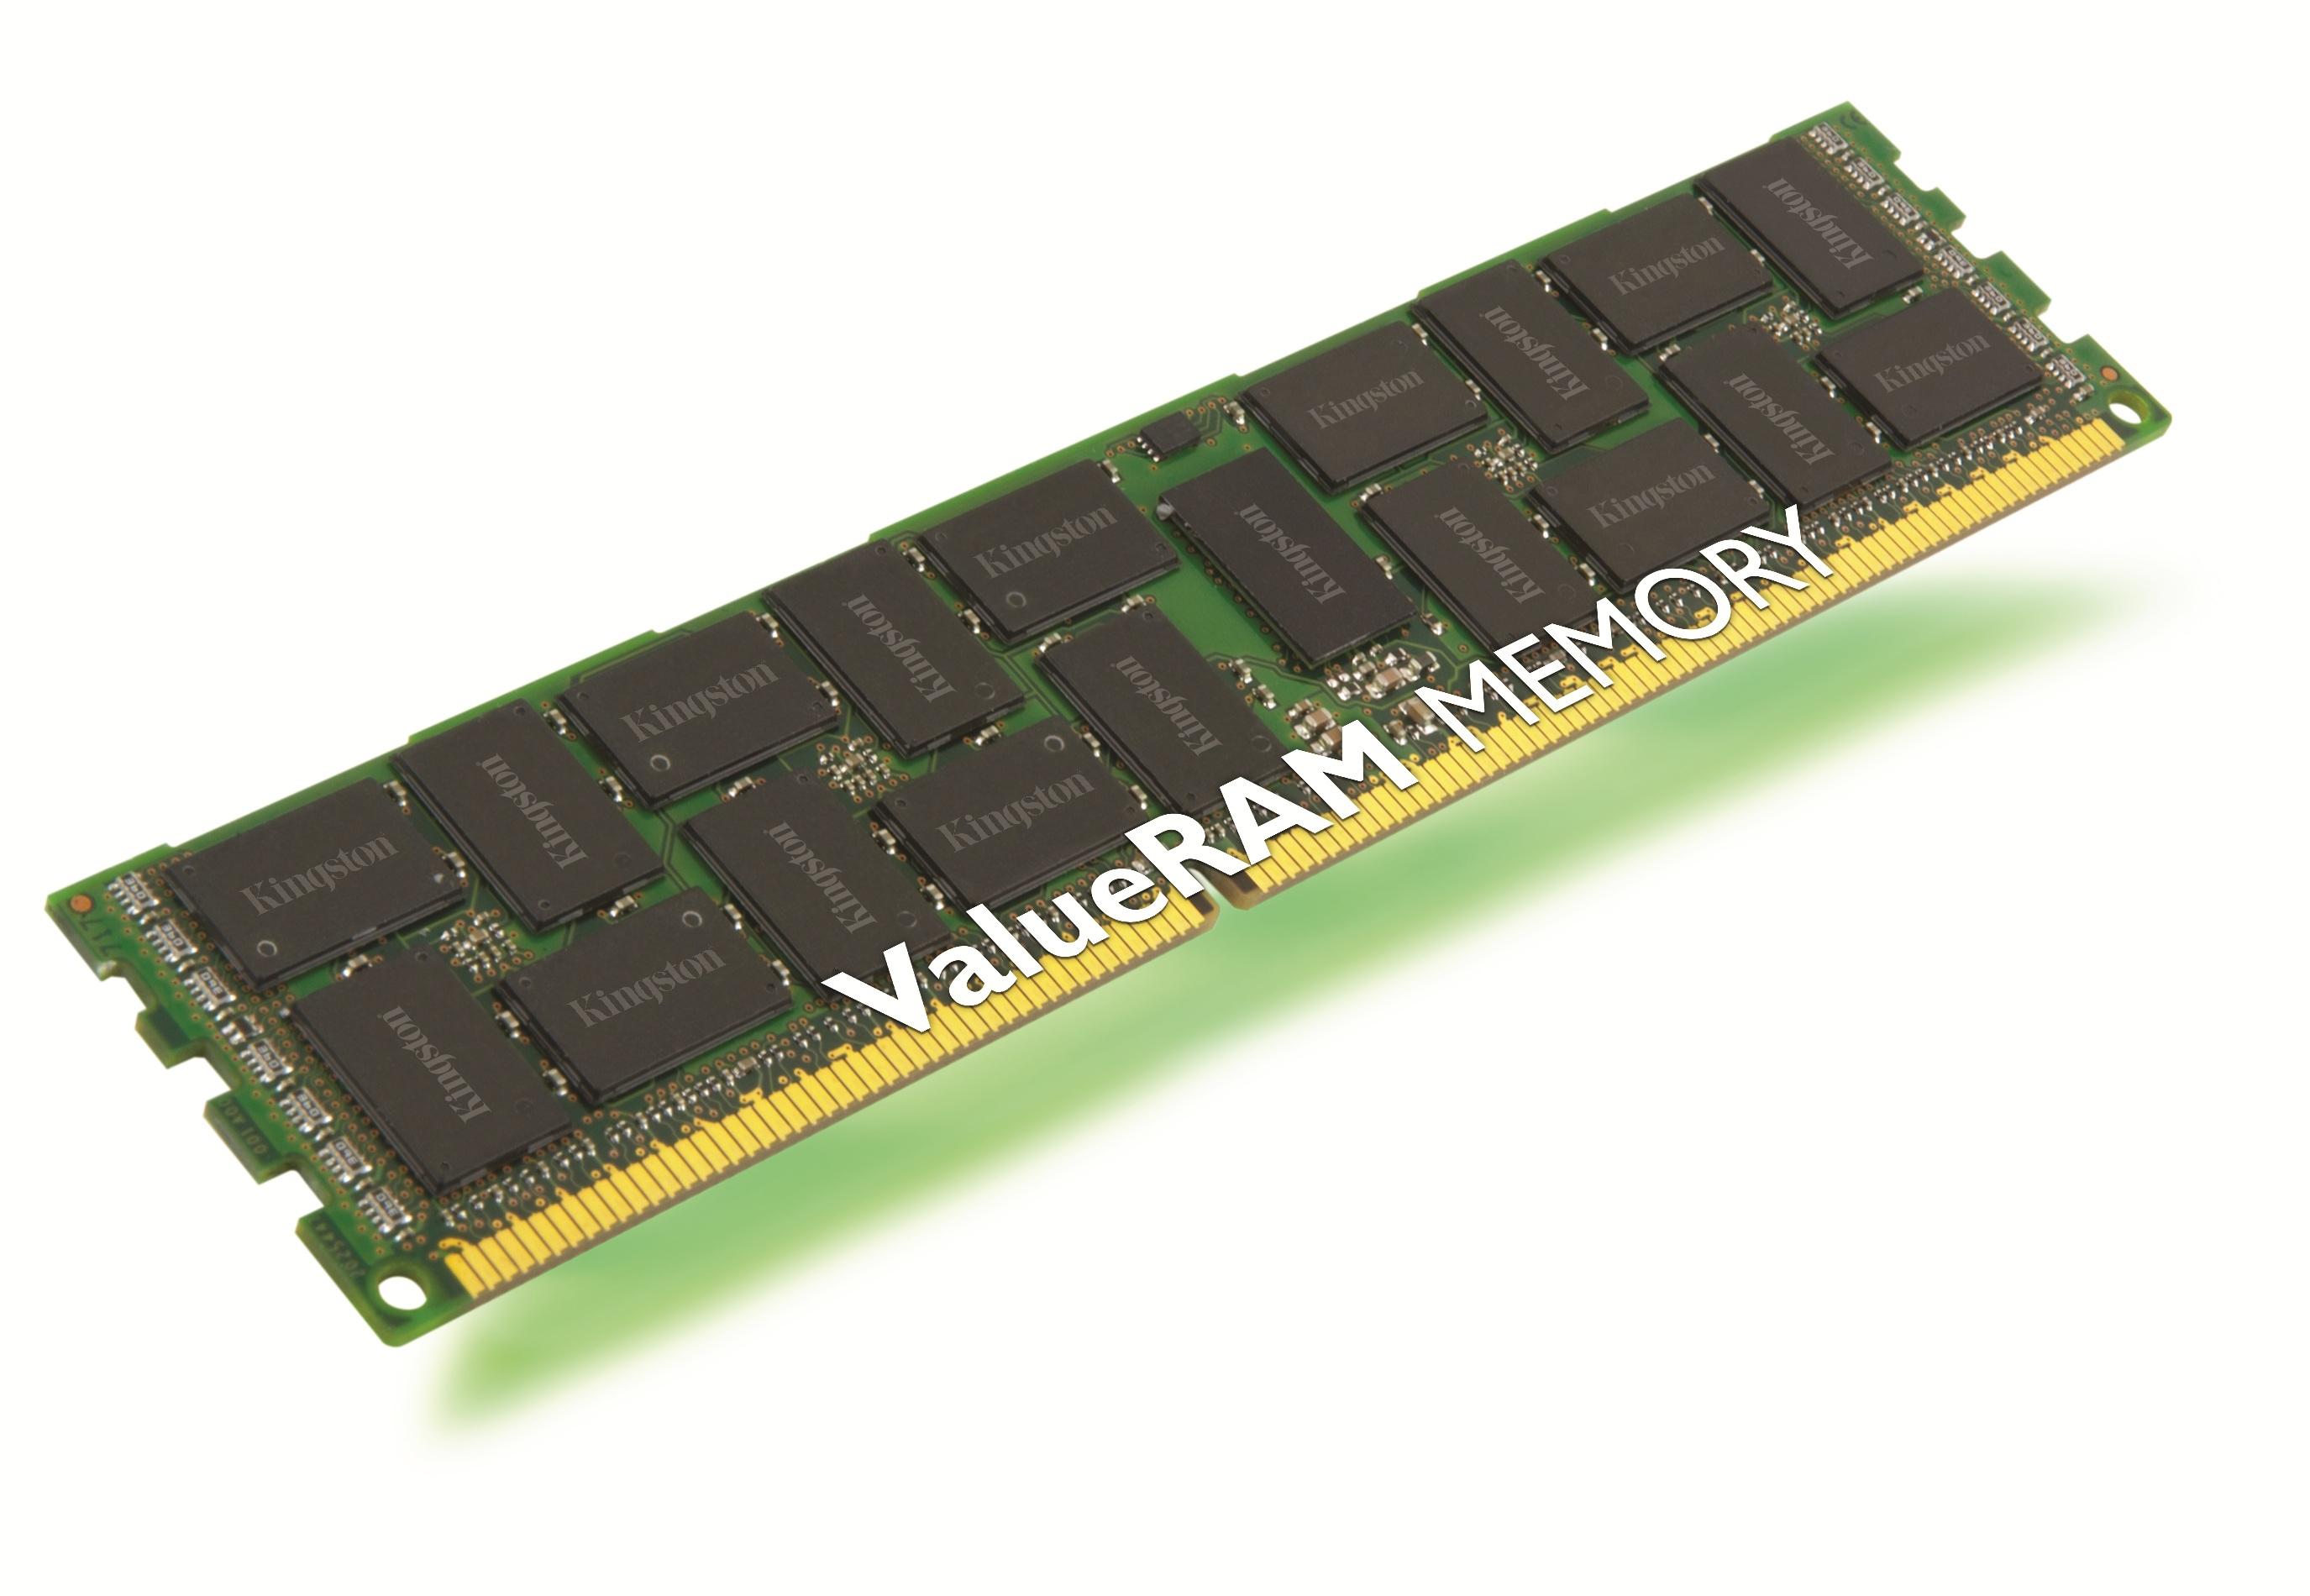 Kingston Technology ValueRAM 16GB DDR3 1333MHz Module 16GB DDR3 1333MHz ECC memory module